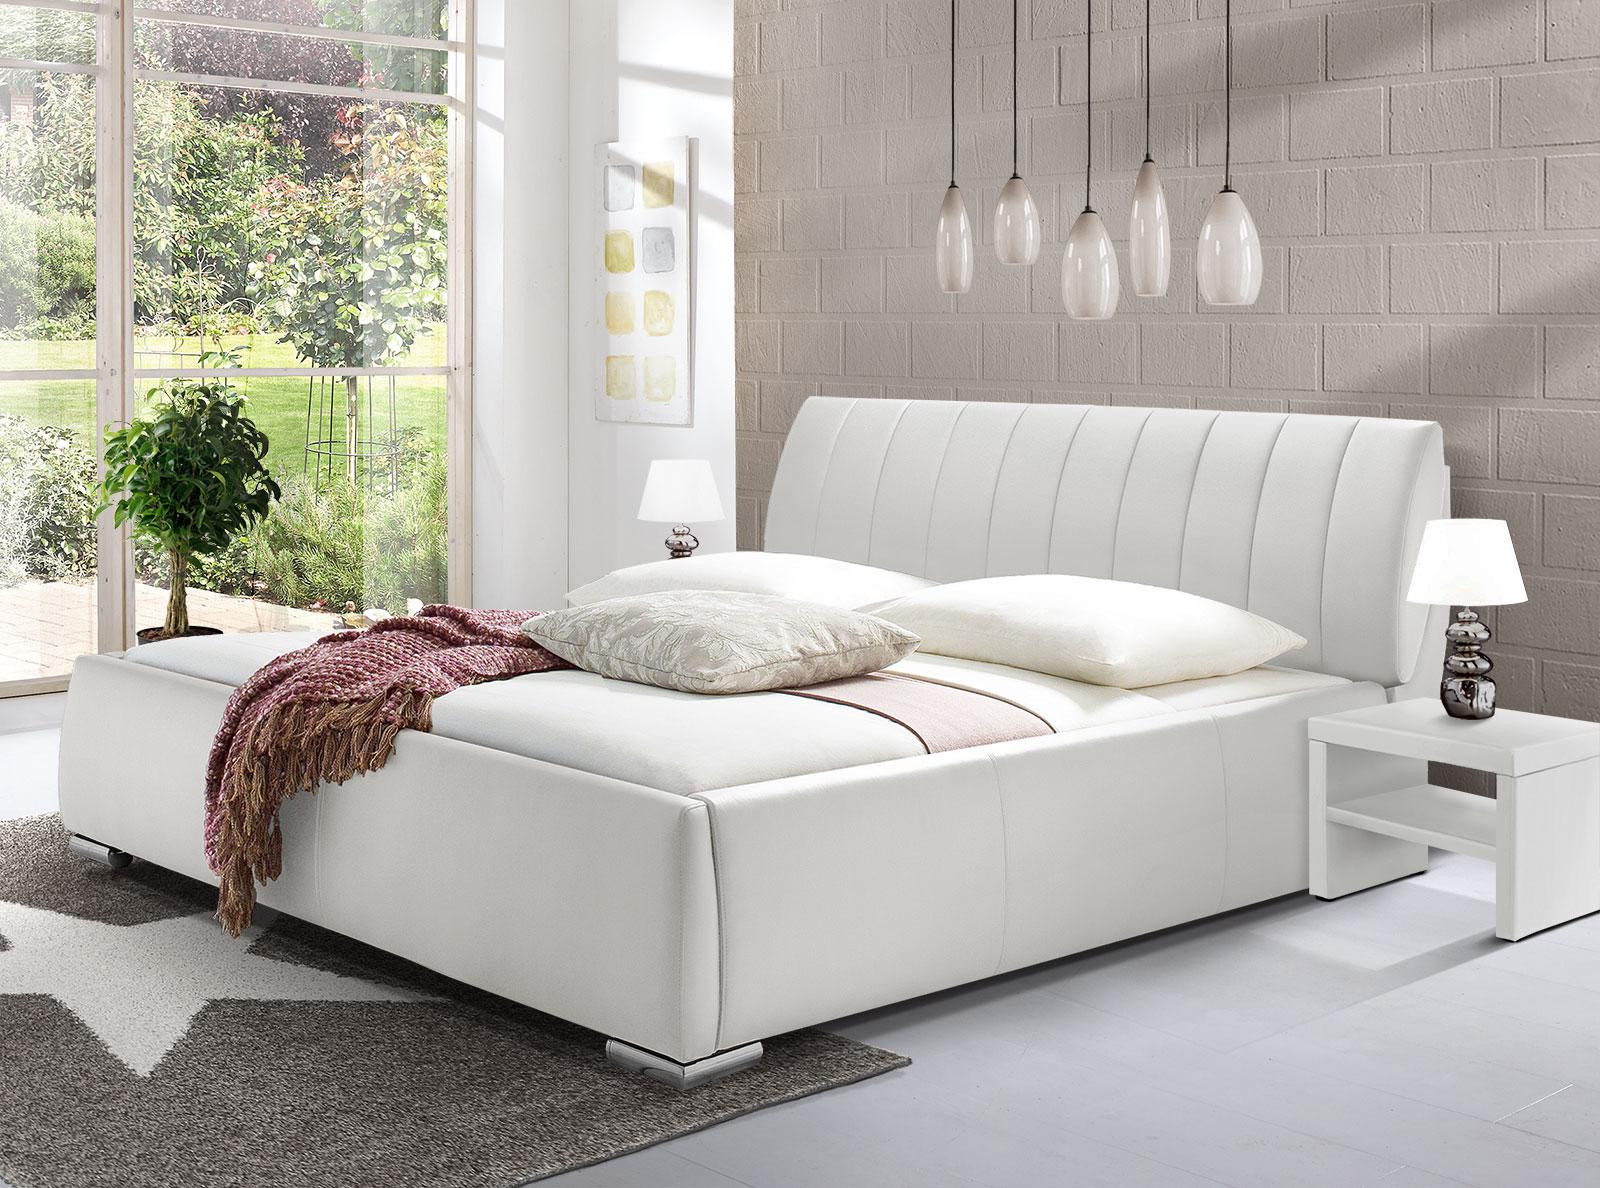 kunstlederbett mit bettkasten und lattenrost lewdown. Black Bedroom Furniture Sets. Home Design Ideas